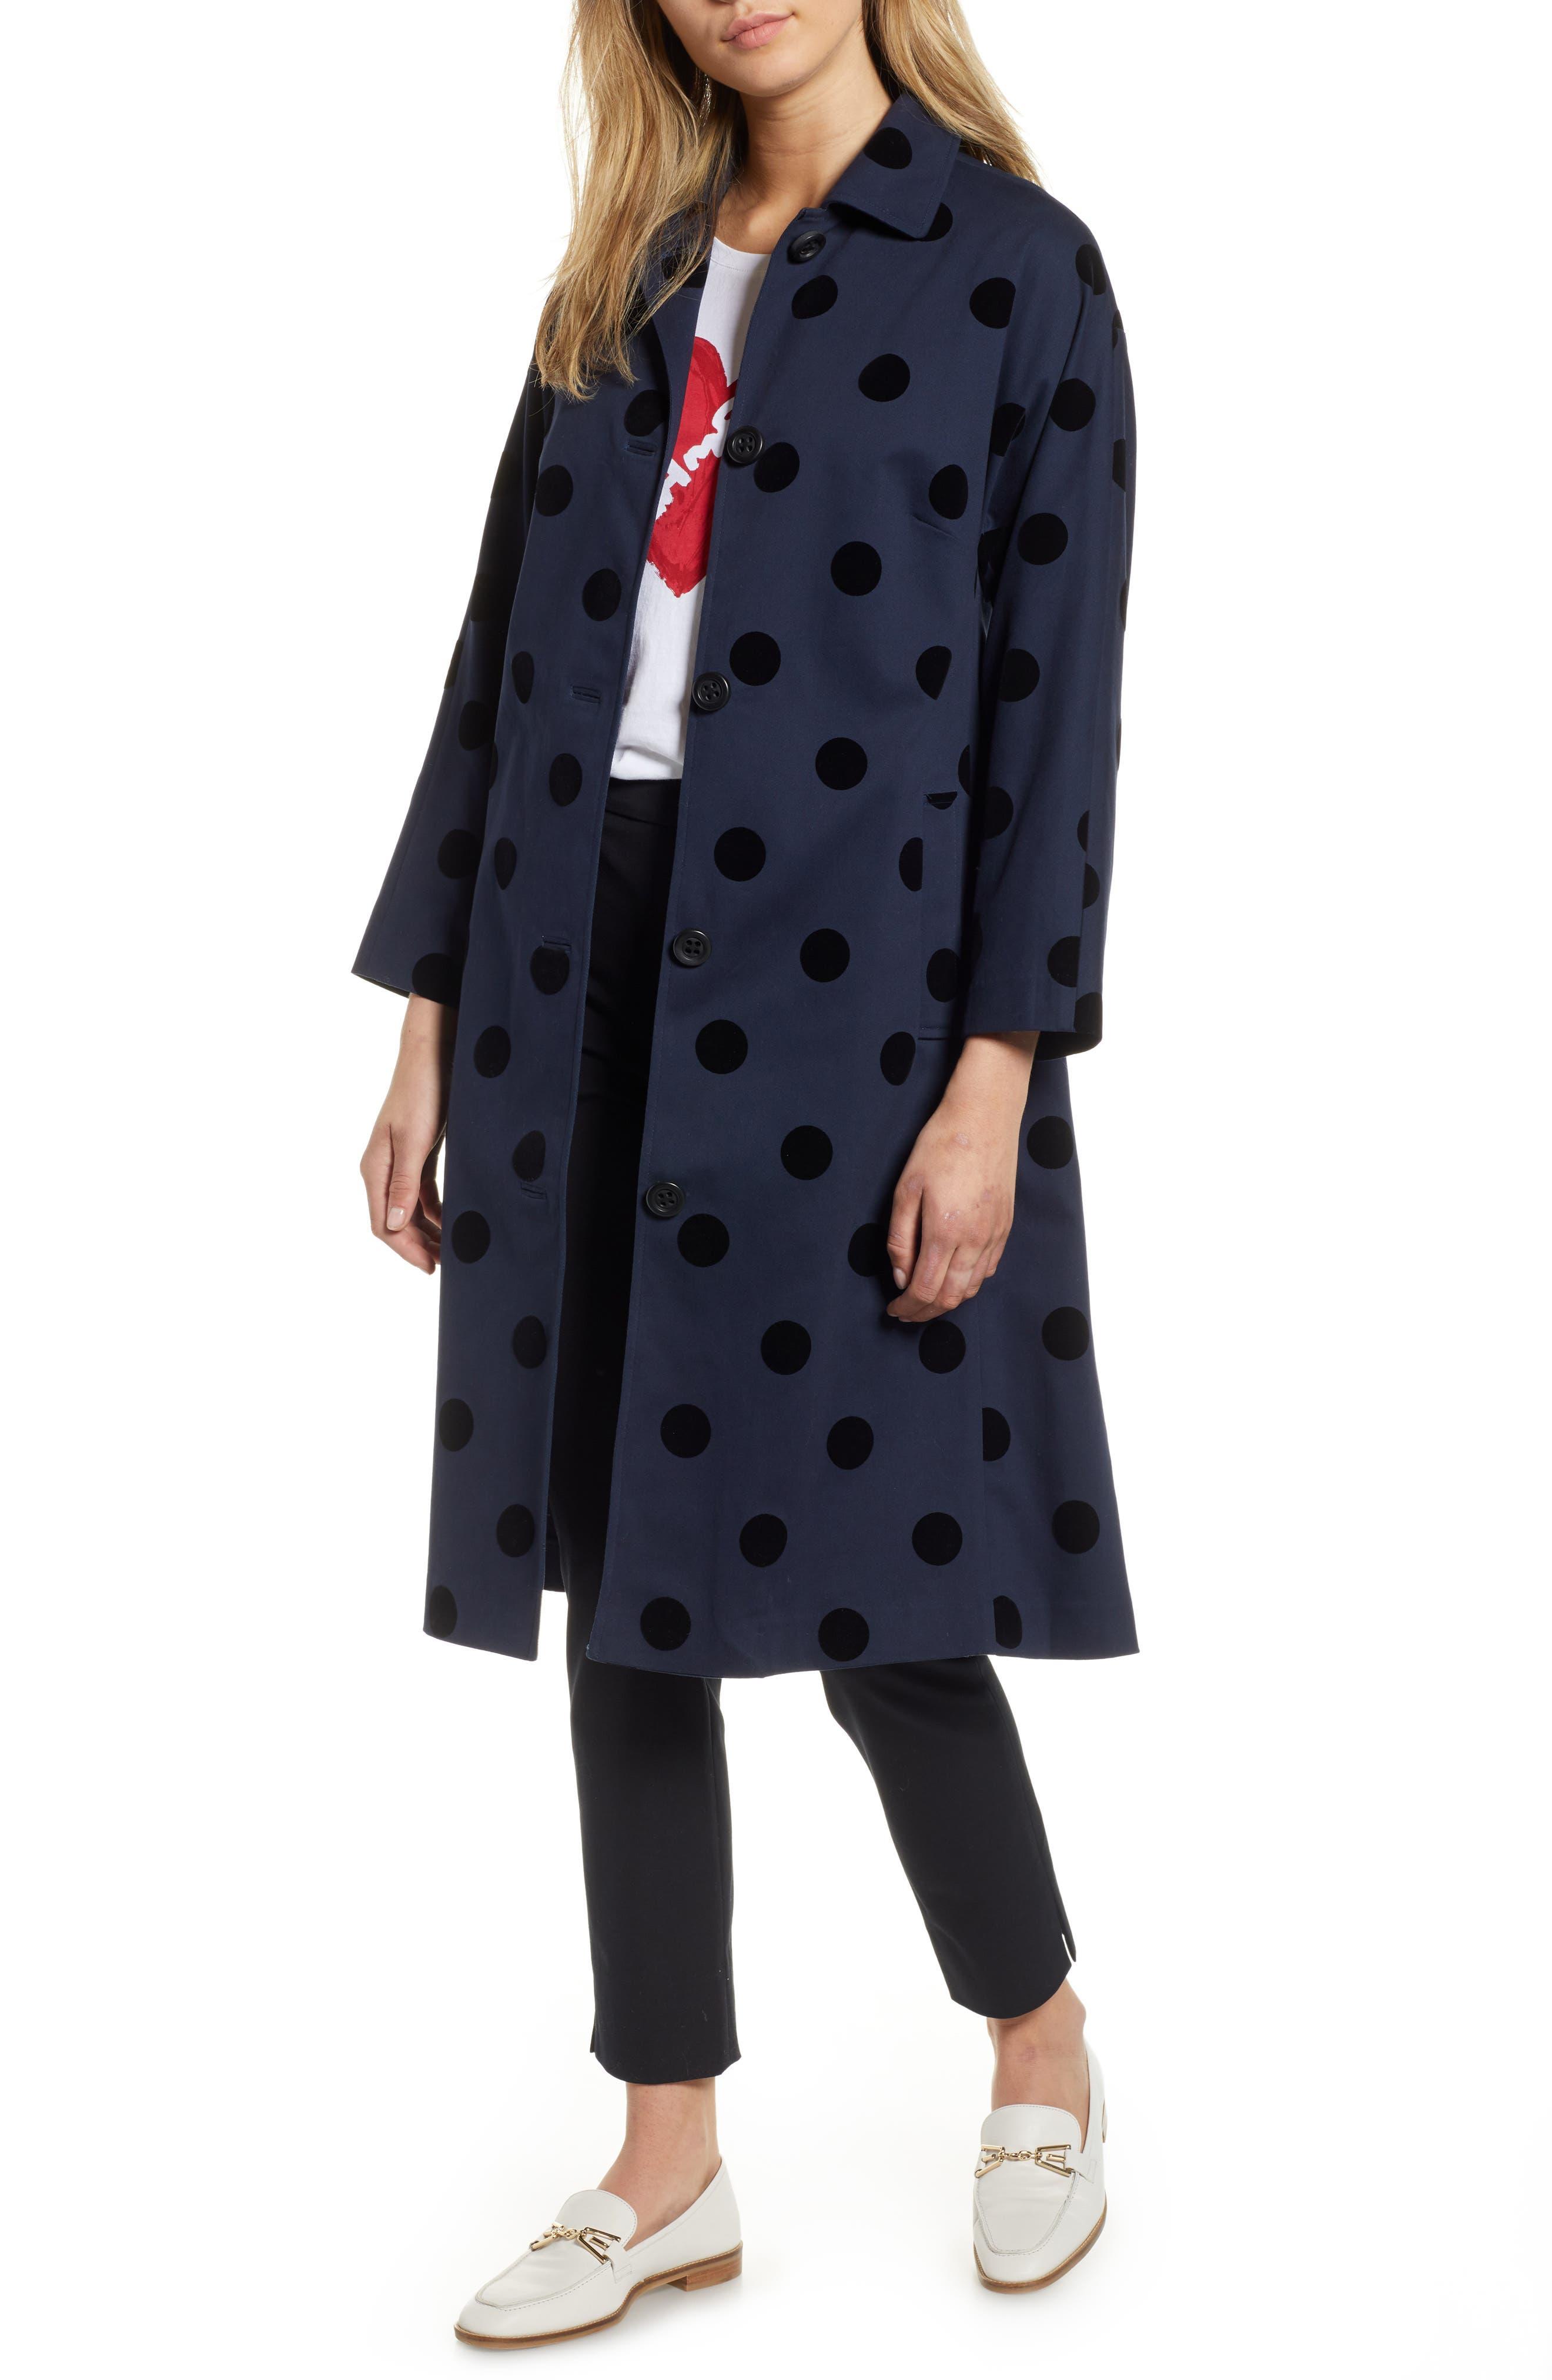 1950s Jackets, Coats, Bolero | Swing, Pin Up, Rockabilly Petite Womens 1901 Polka Dot Swing Coat Size 00P - Blue $95.40 AT vintagedancer.com